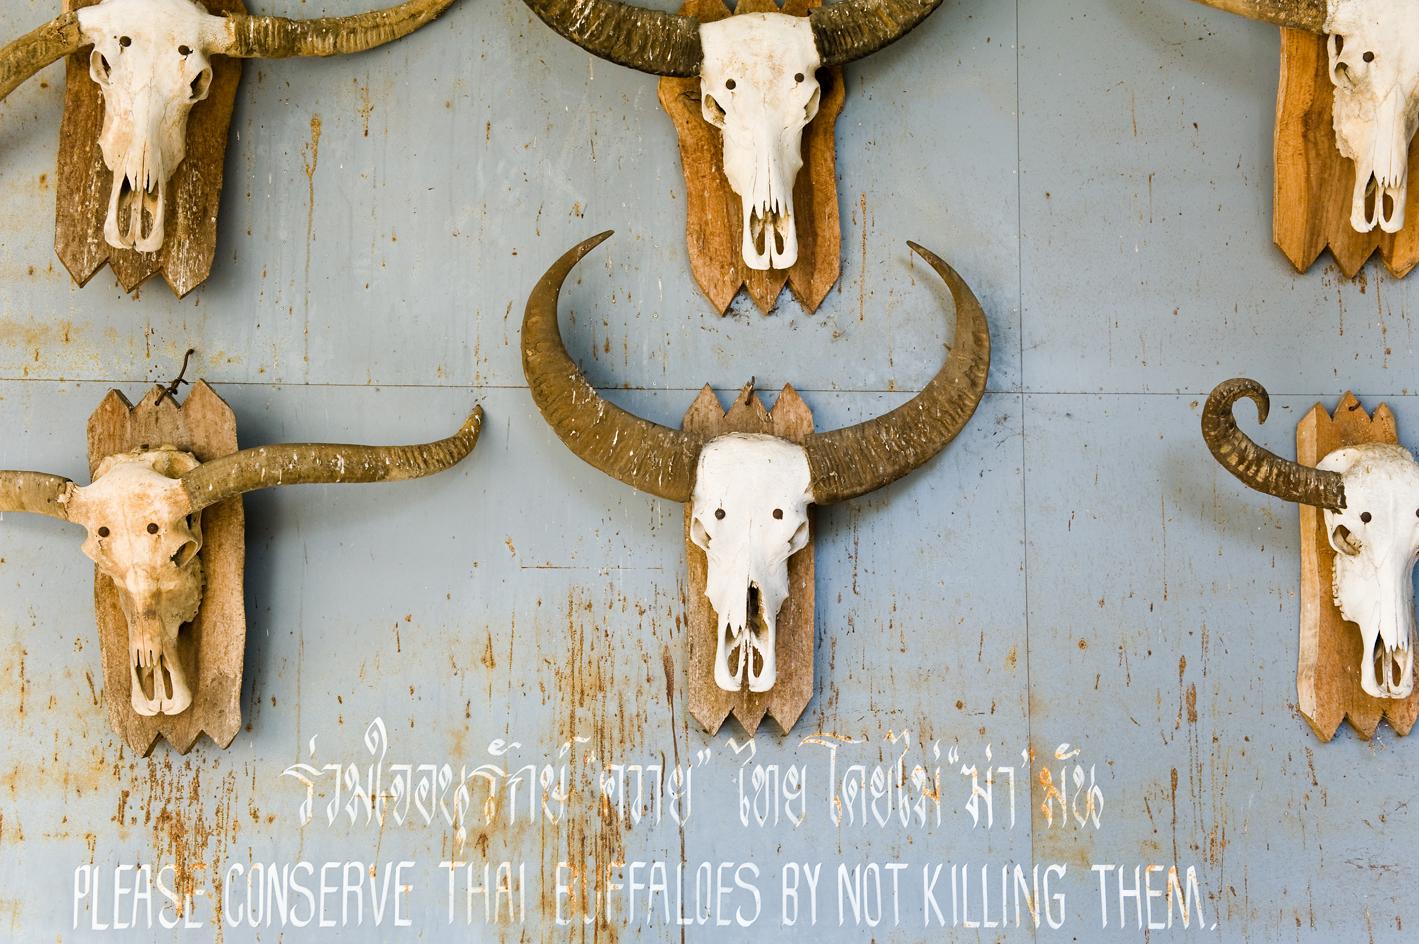 thailand buffalo skulls